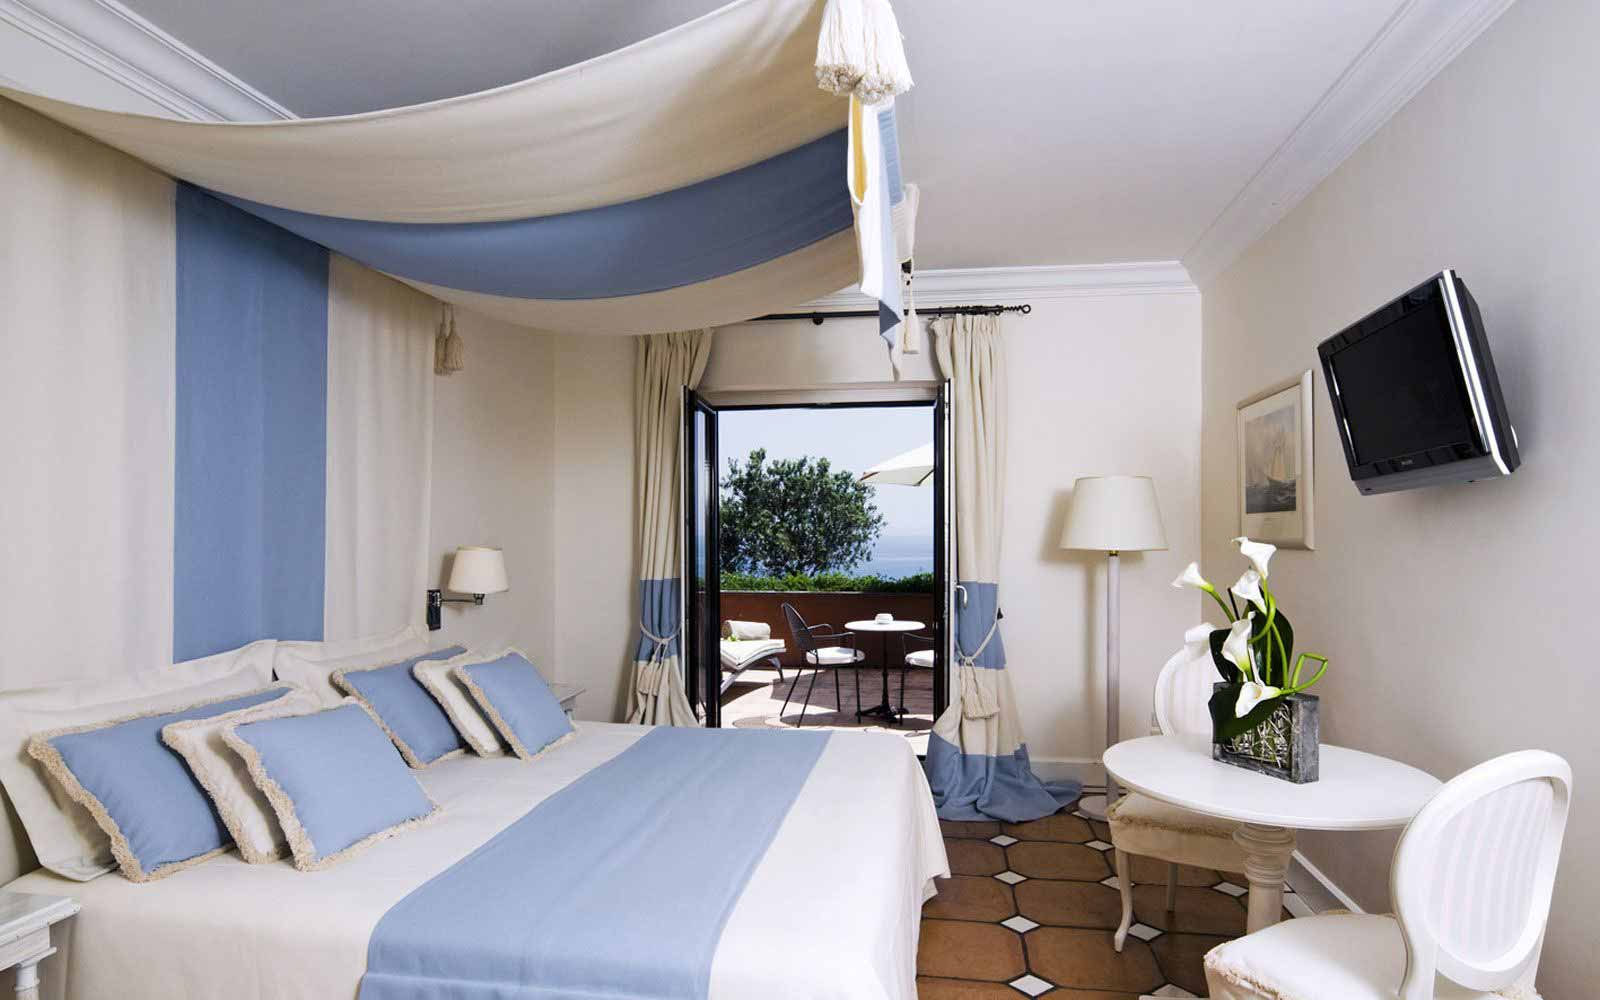 Superior Park Room at Mezzatorre Resort & Spa